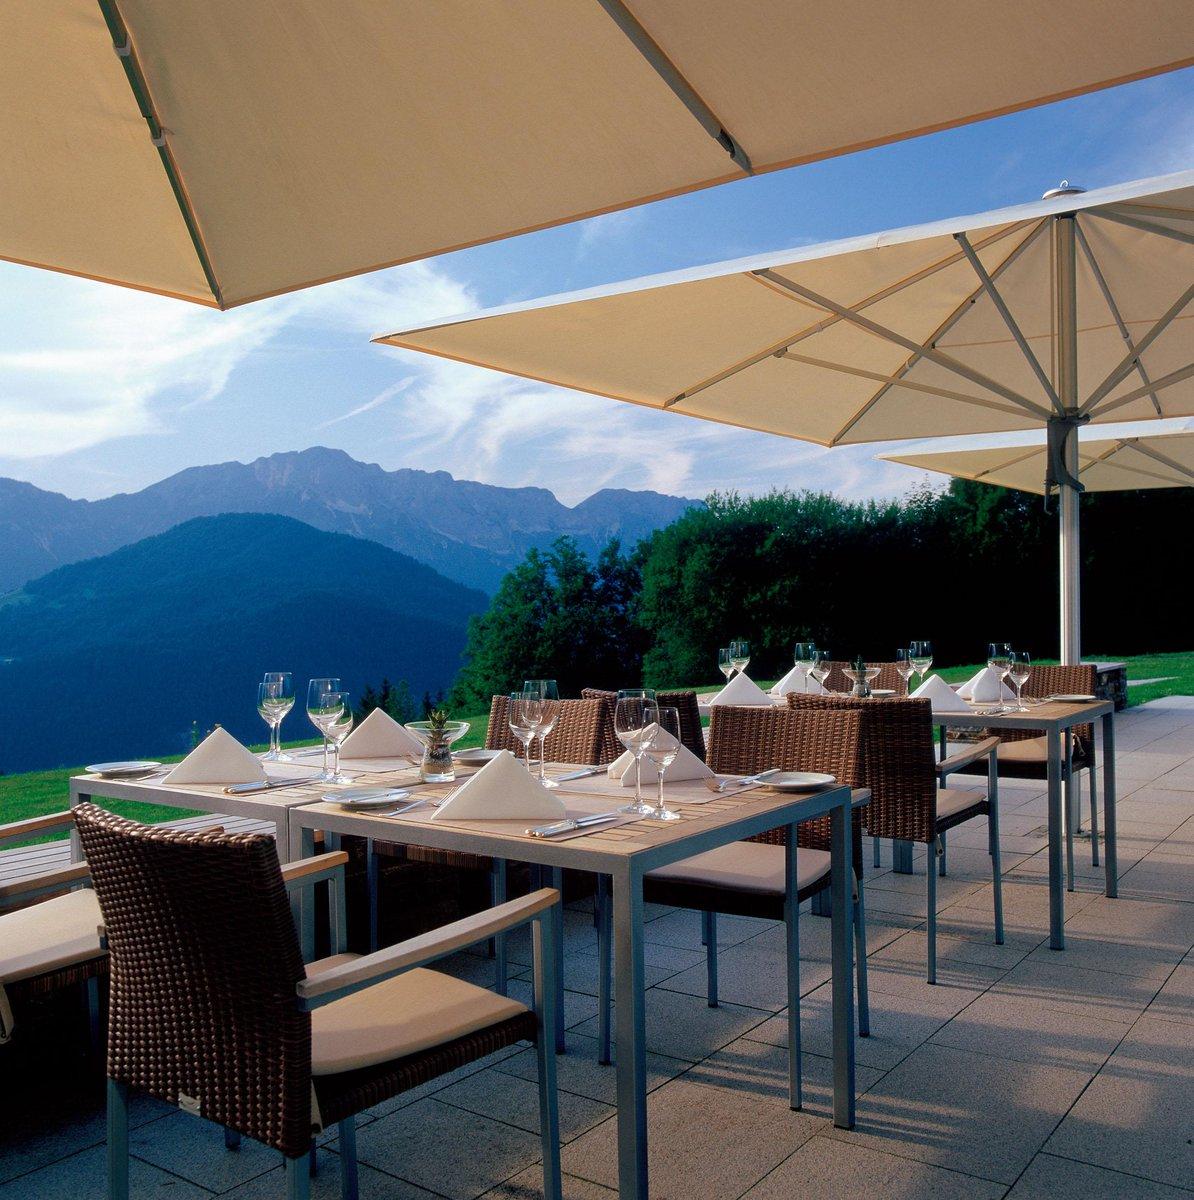 Morgen schon bei bestem Wetter auf d. Terrasse im @Kempinski #Berchtesgaden - wir freuen uns! http://t.co/eFBuiwlhm9